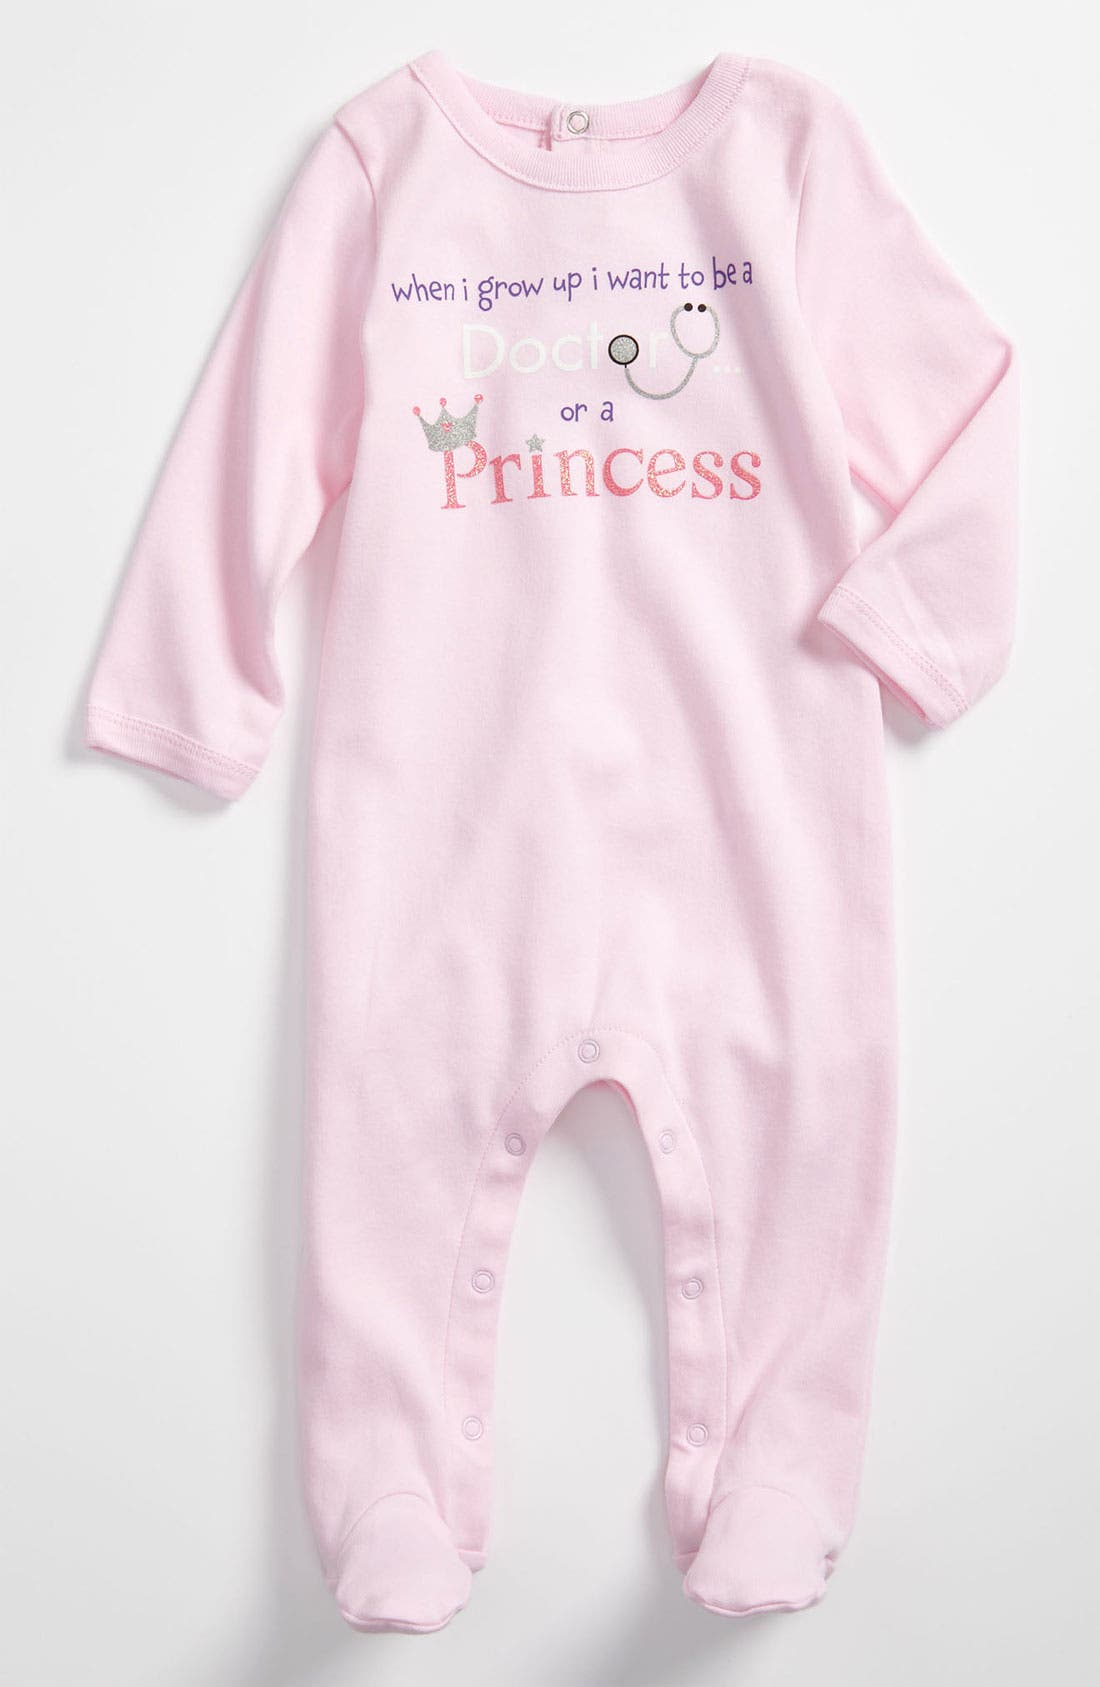 Alternate Image 1 Selected - Sara Kety Baby & Kids 'Doctor Princess' Footie (Infant)